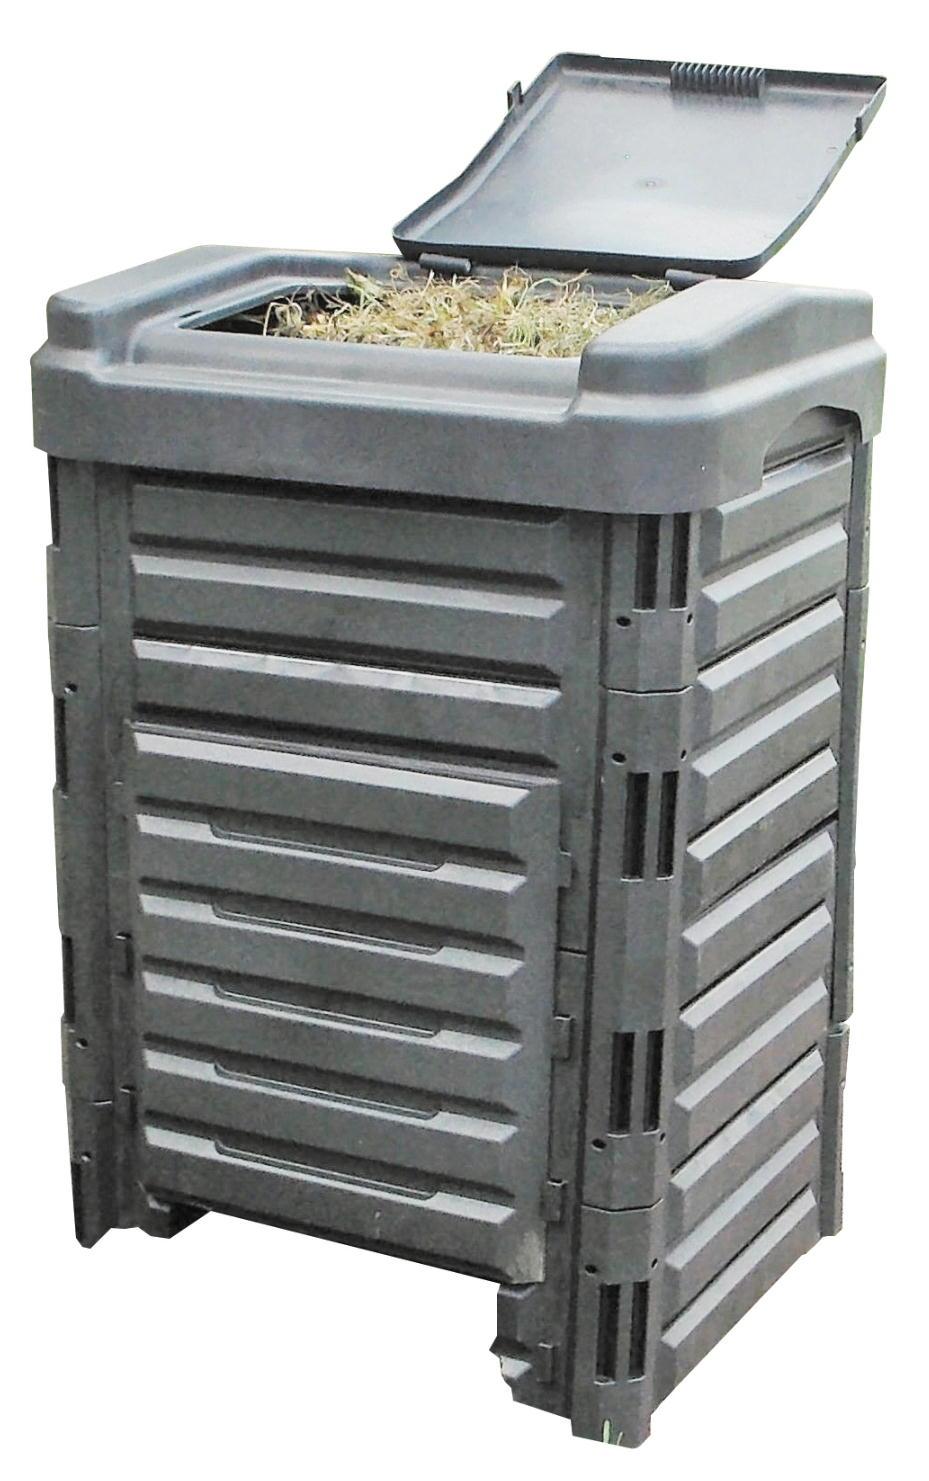 http://gr-garden.com/item/ground/compost.jpg